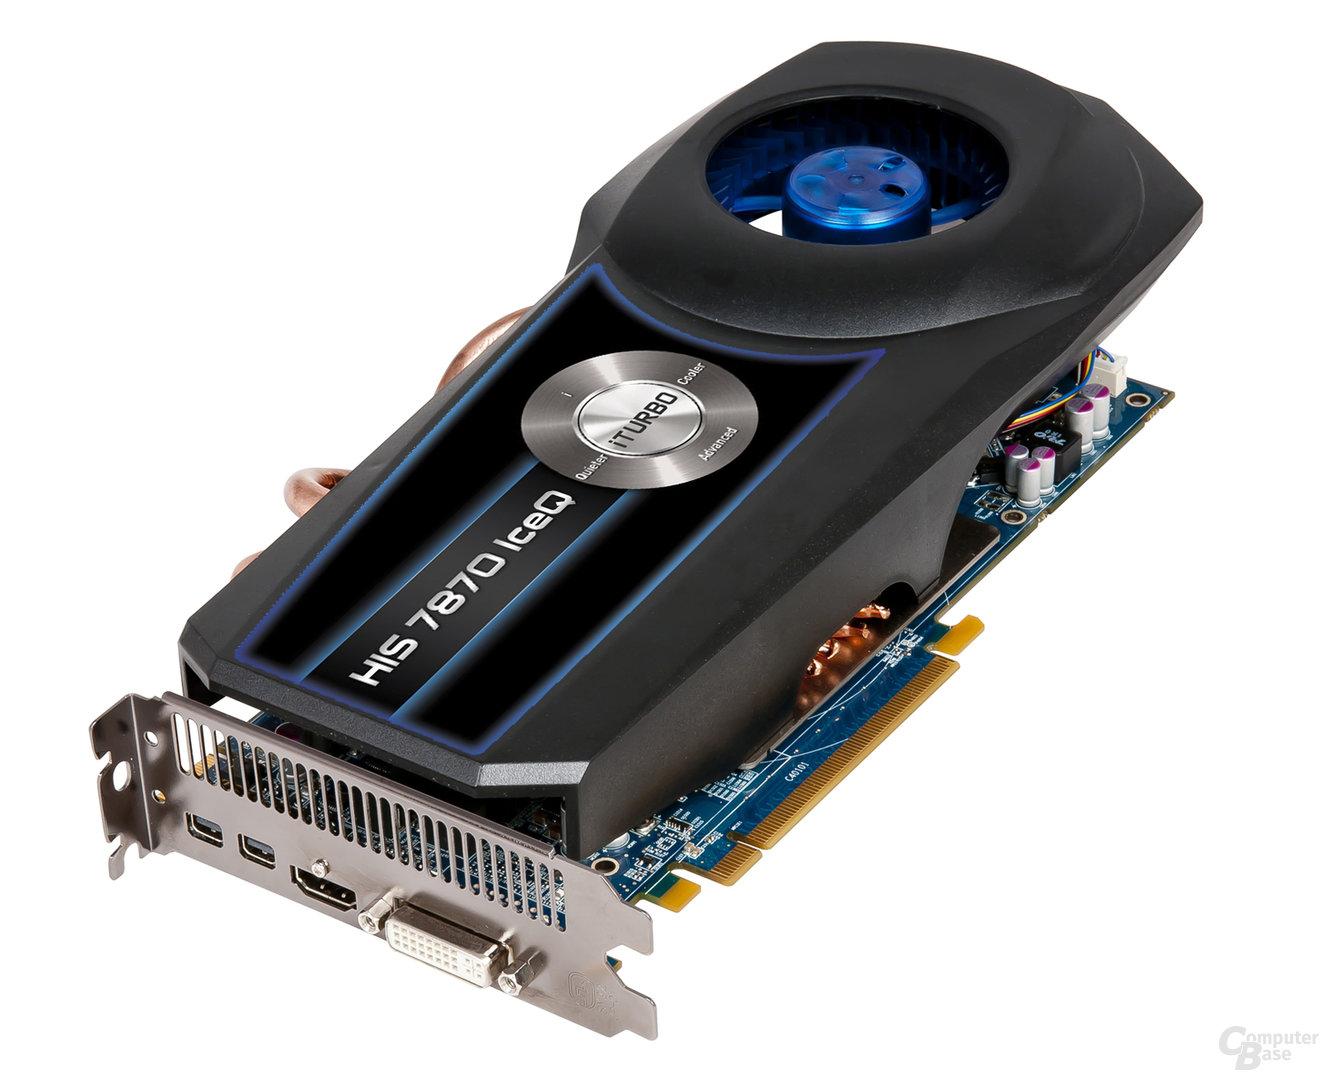 HIS Radeon HD 7870 Turbo